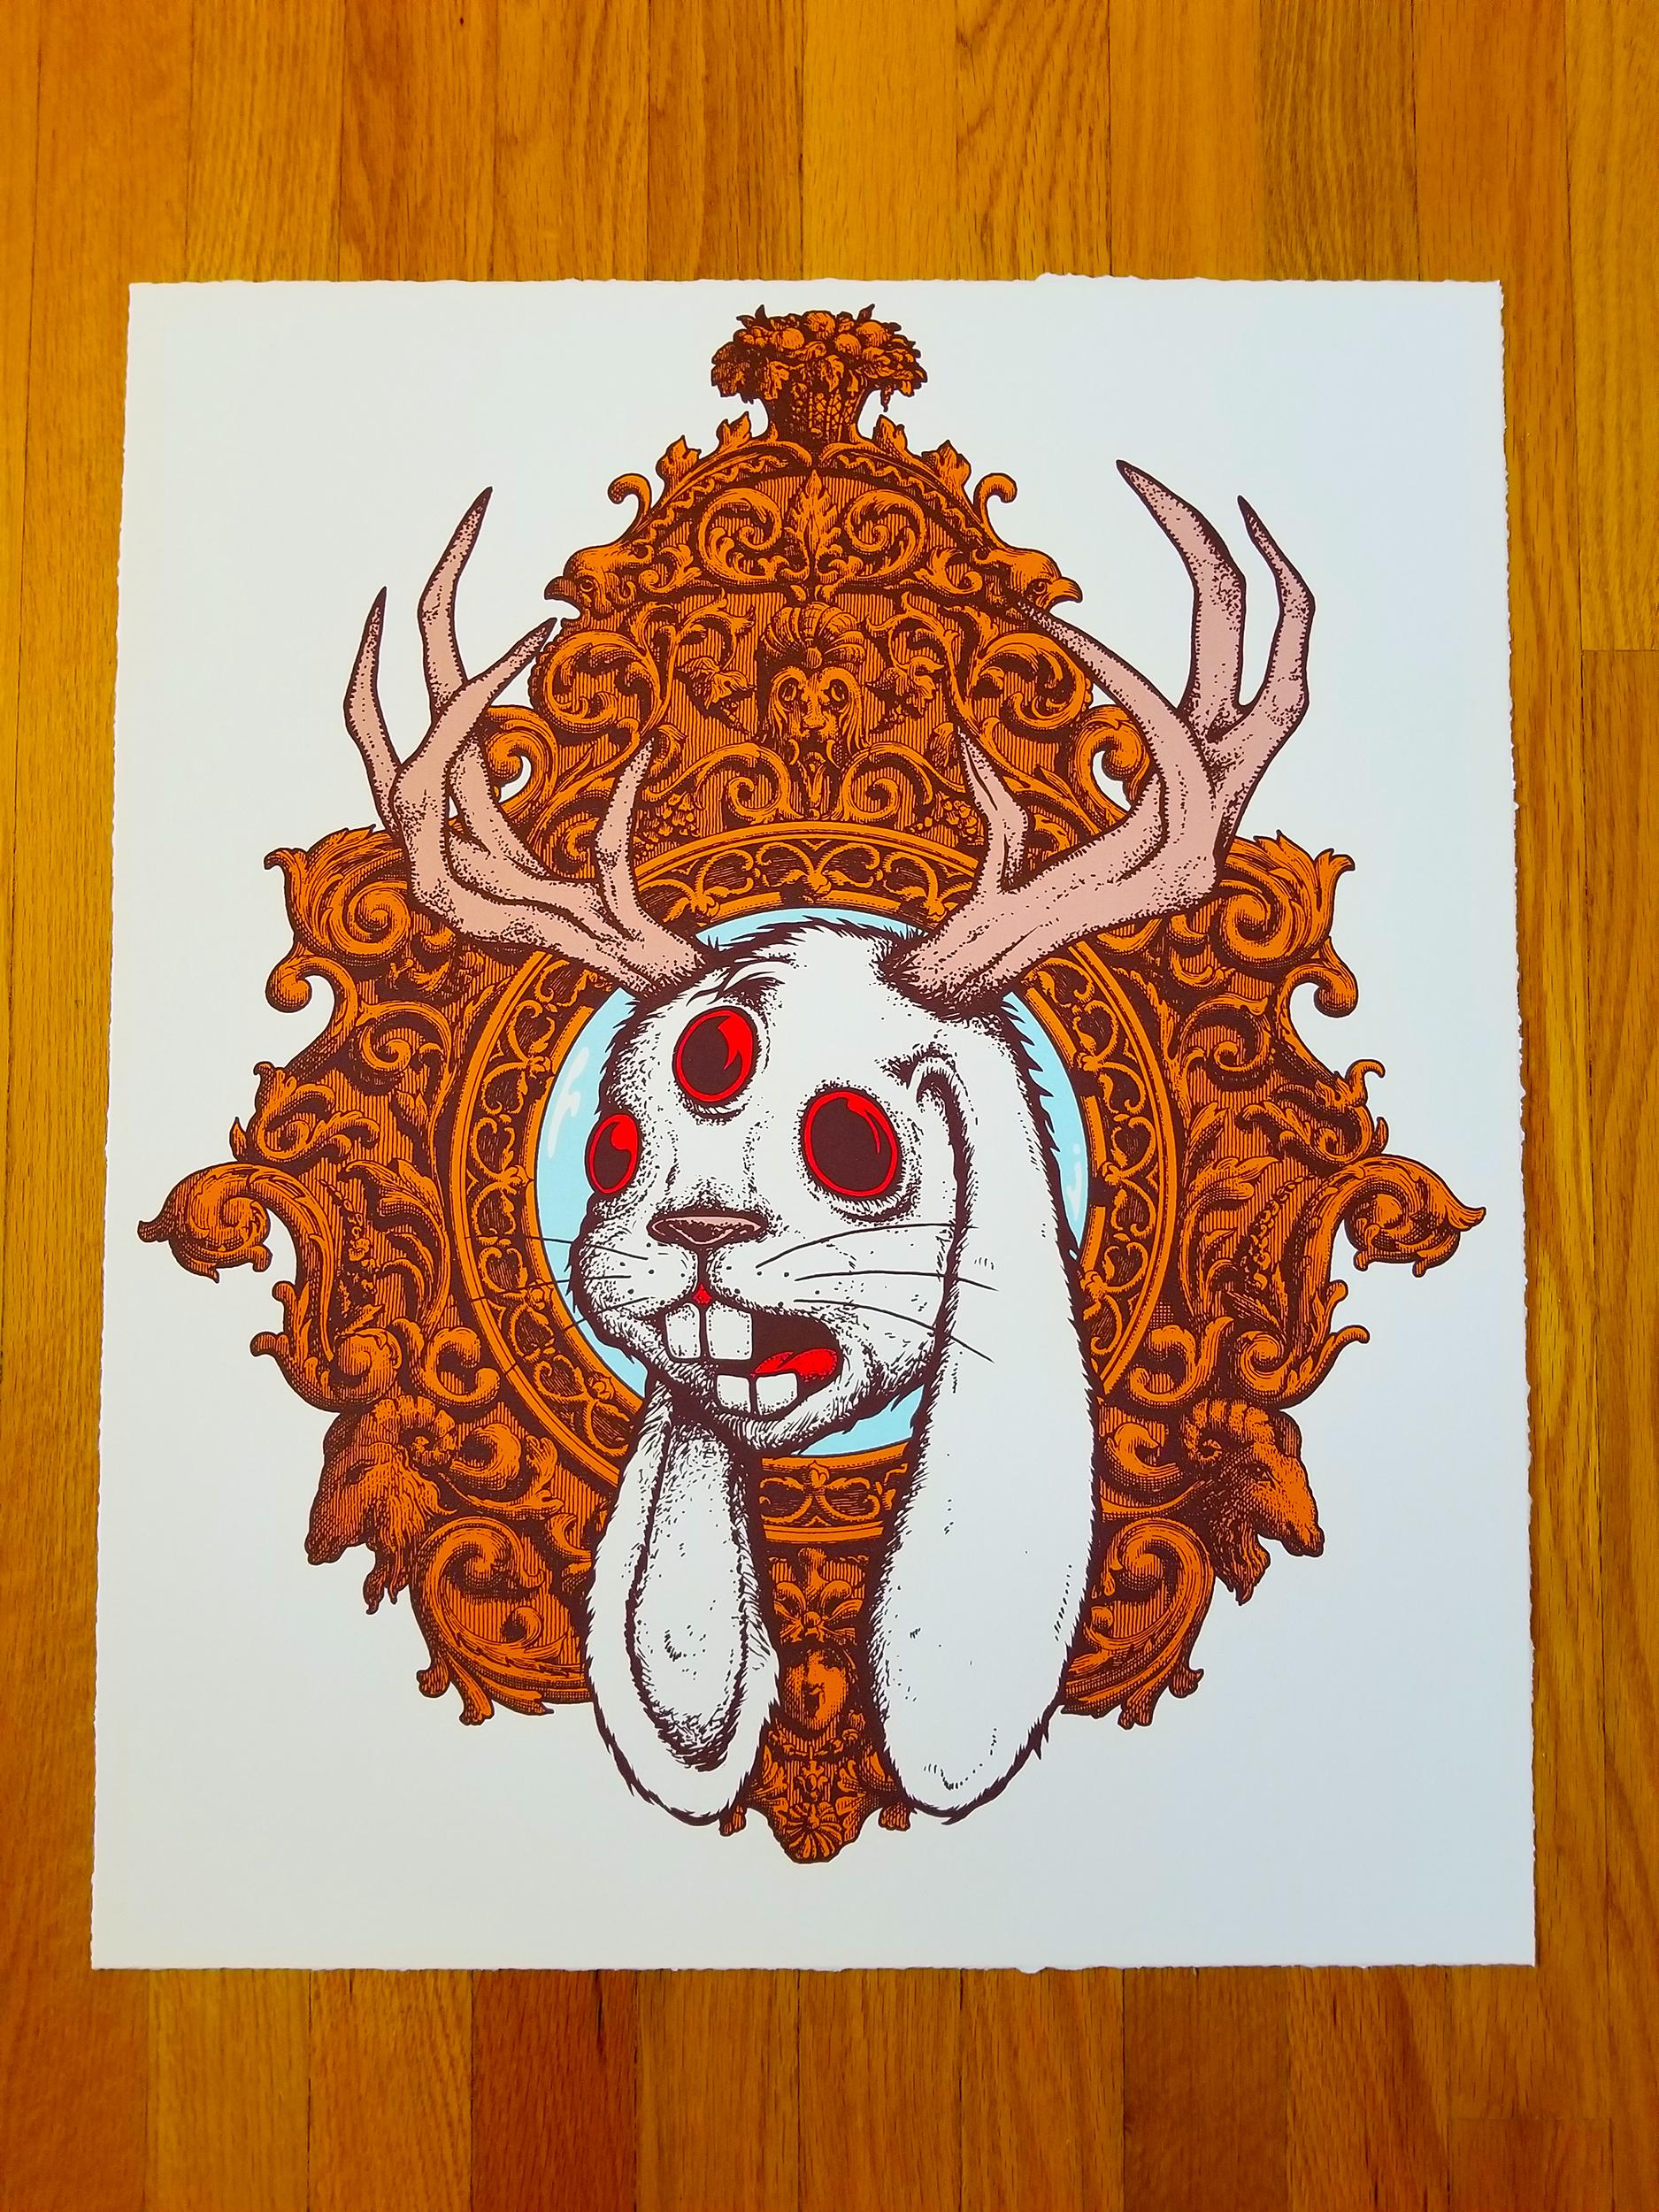 New - 'JACKALOPE' Art Print (Gallery Edition - STUDIO COPIES)